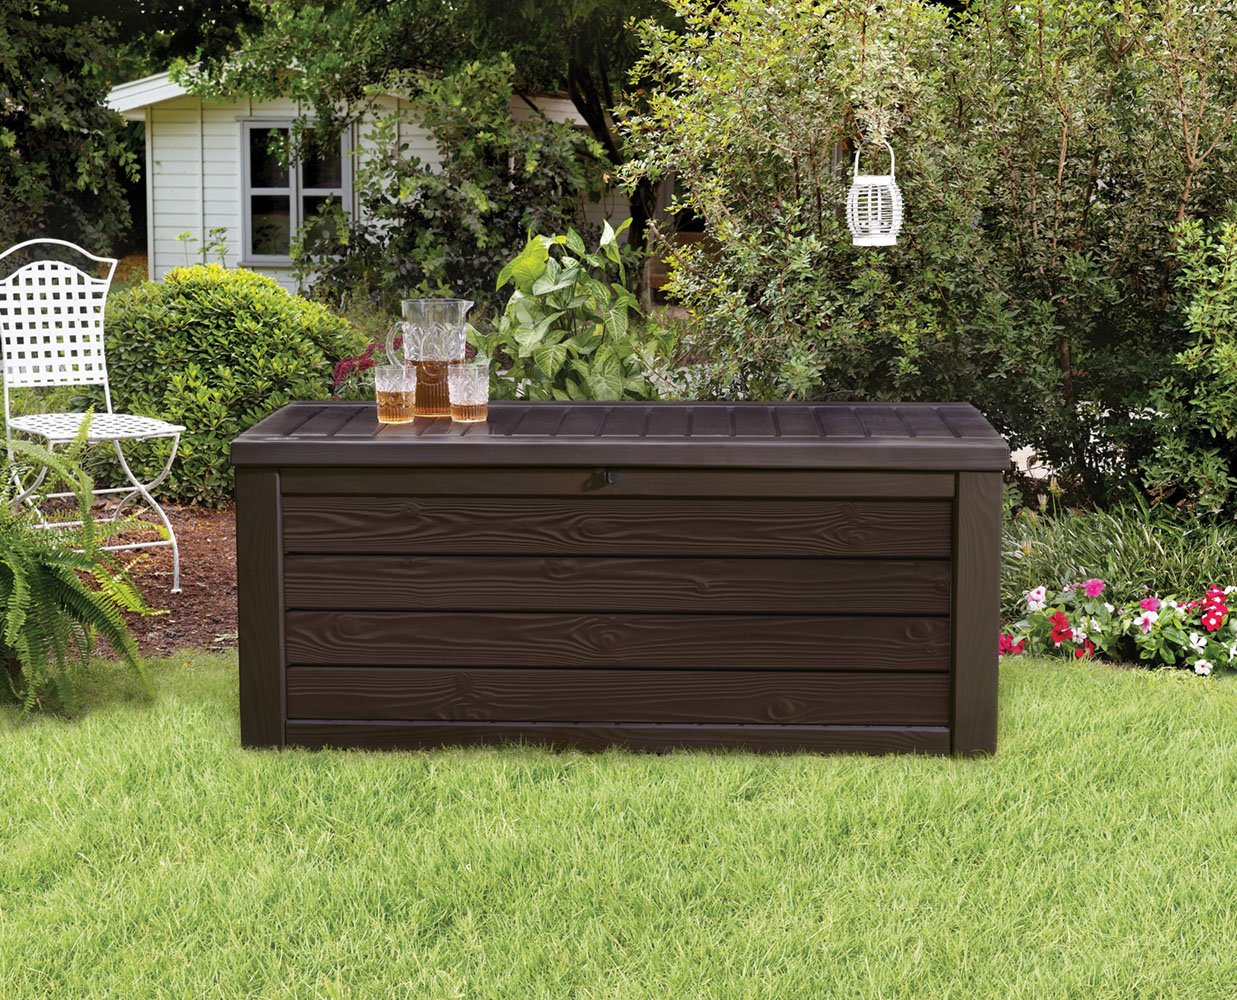 Keter Westwood Plastic Deck Storage Container Box Outdoor Patio Garden  Furniture 150 Gal Deck Boxes Brown Patio, Lawn & Garden Outdoor Storage